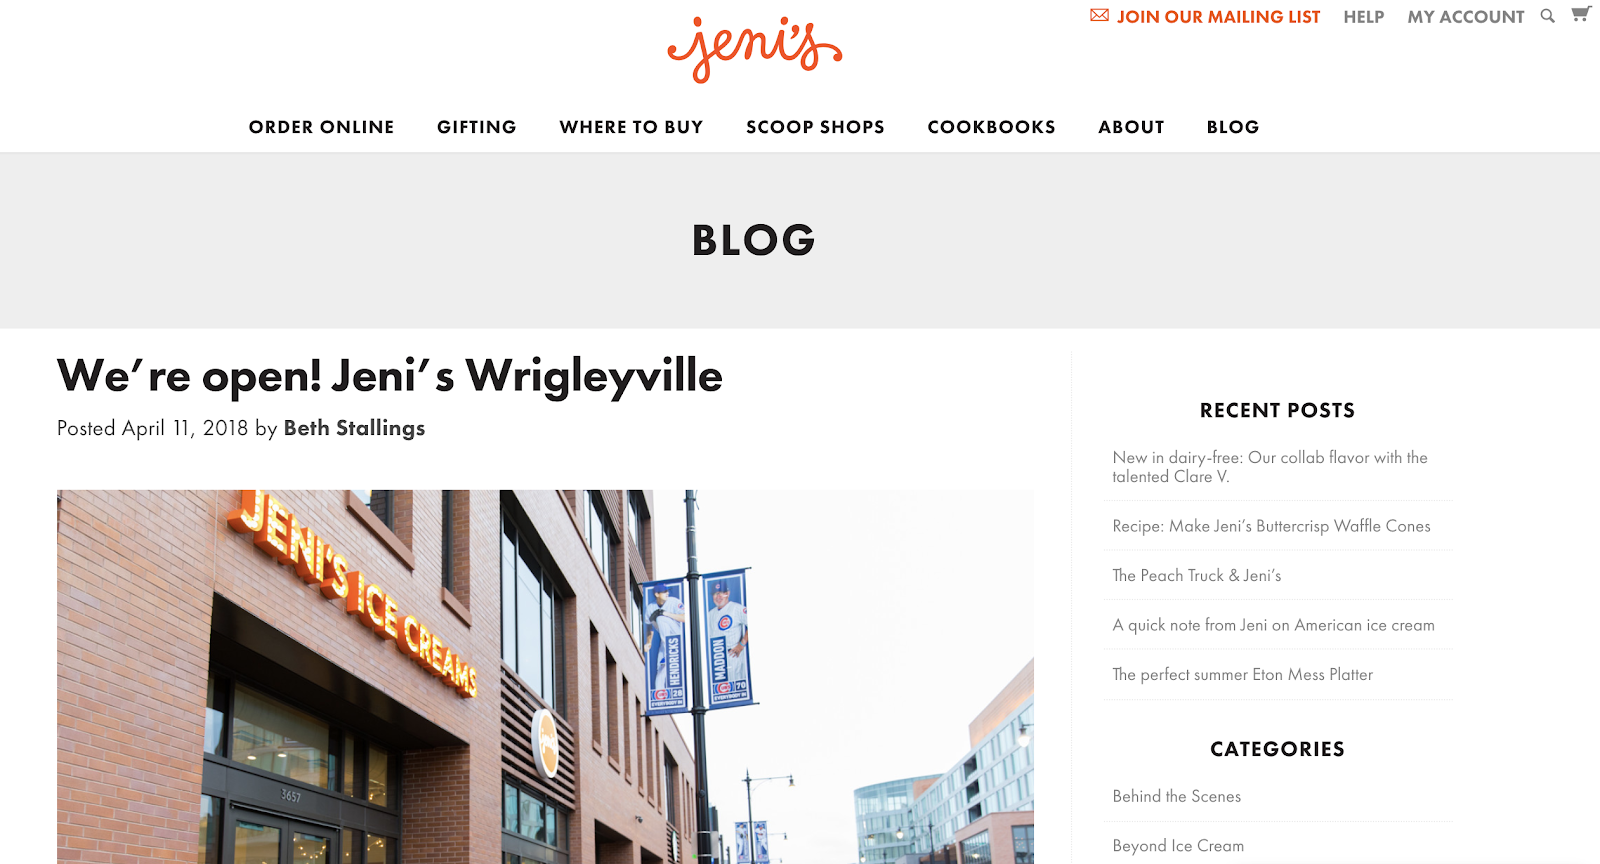 Jeni's Splendid Ice Cream New Location